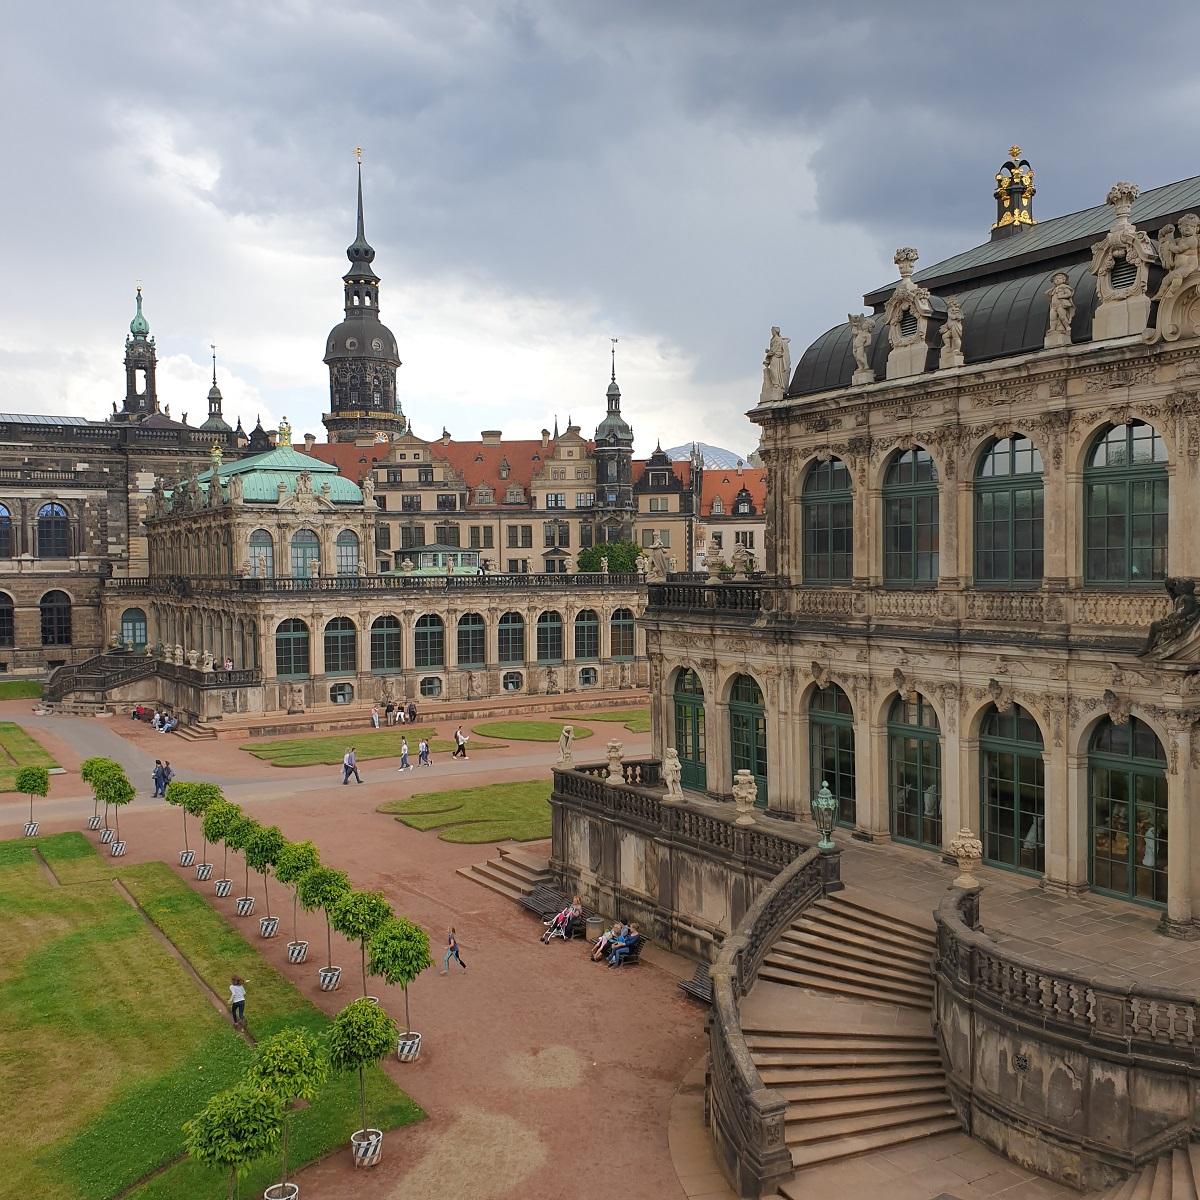 Tuinen en gebouwen_Zwinger_Dresden_Sächsische_Schweiz